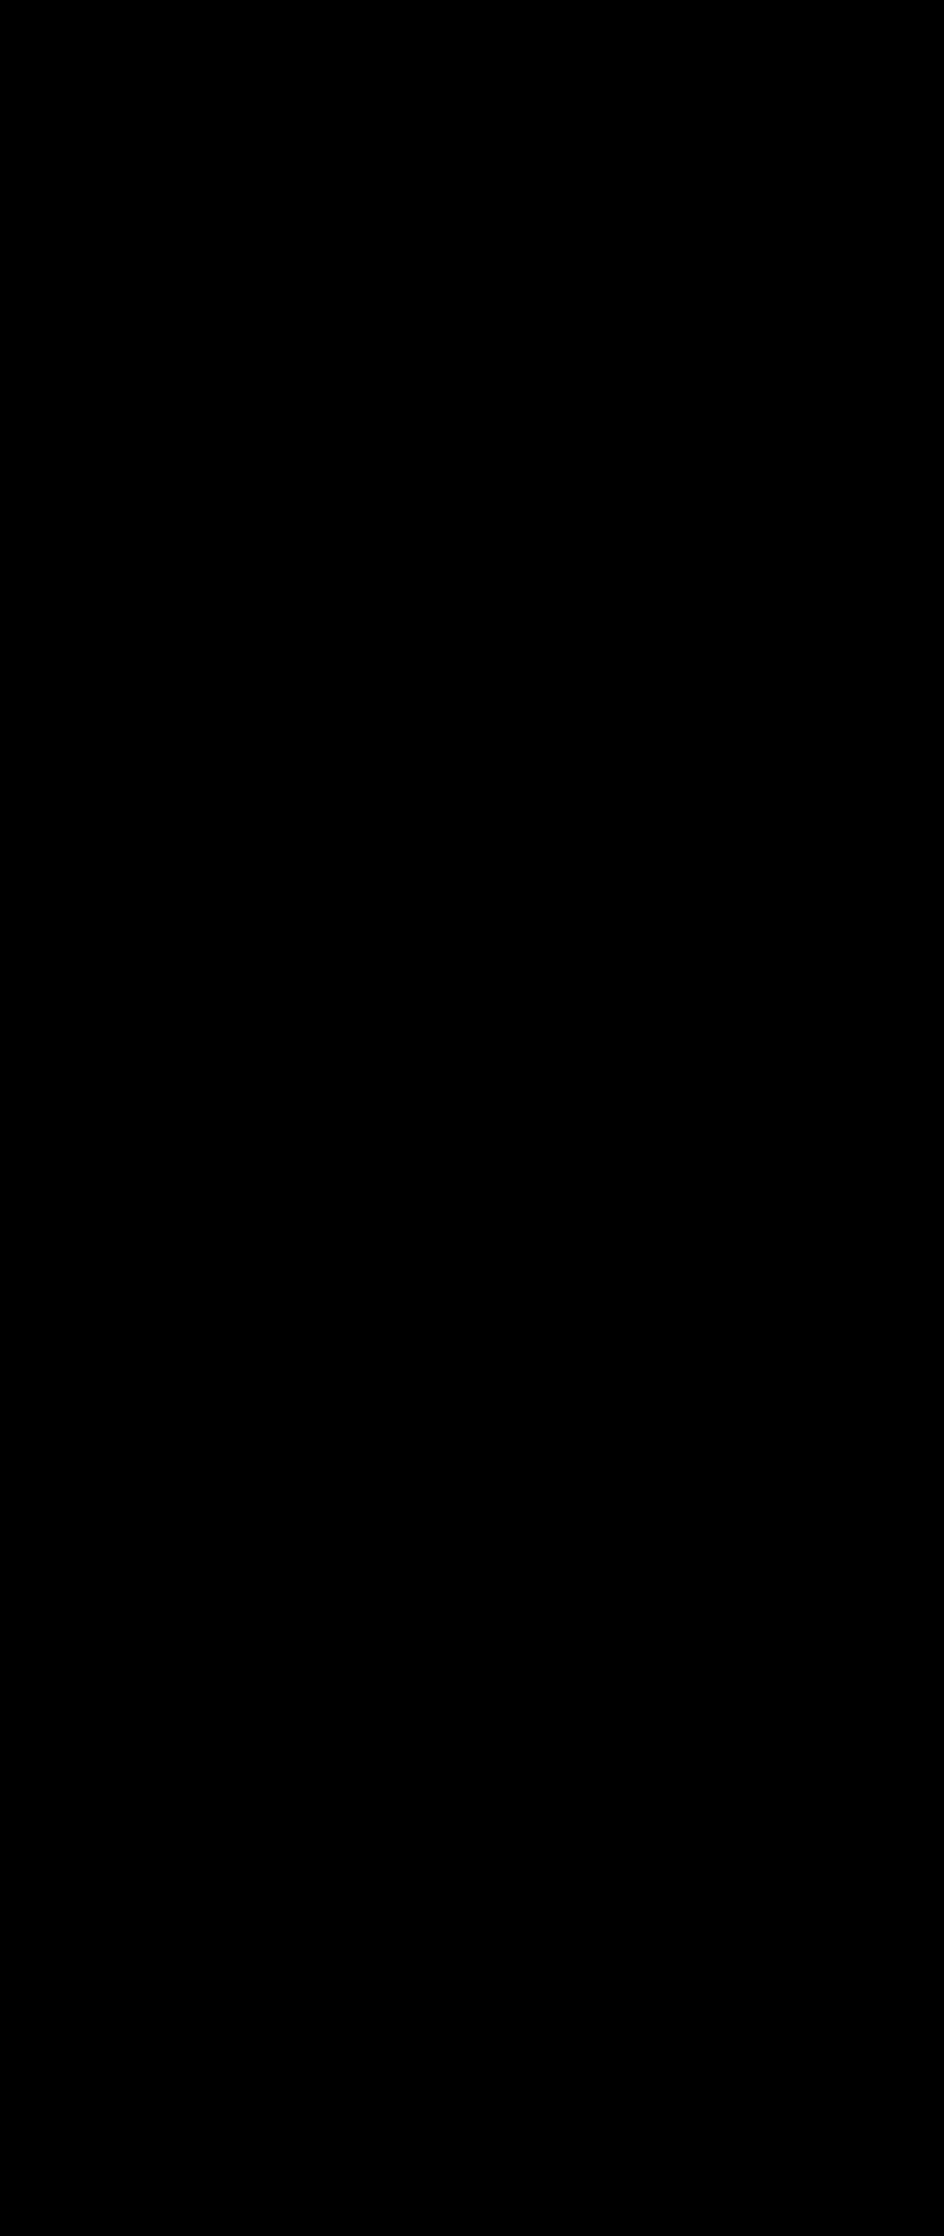 Arms clipart silhouette. Raised ballerina big image